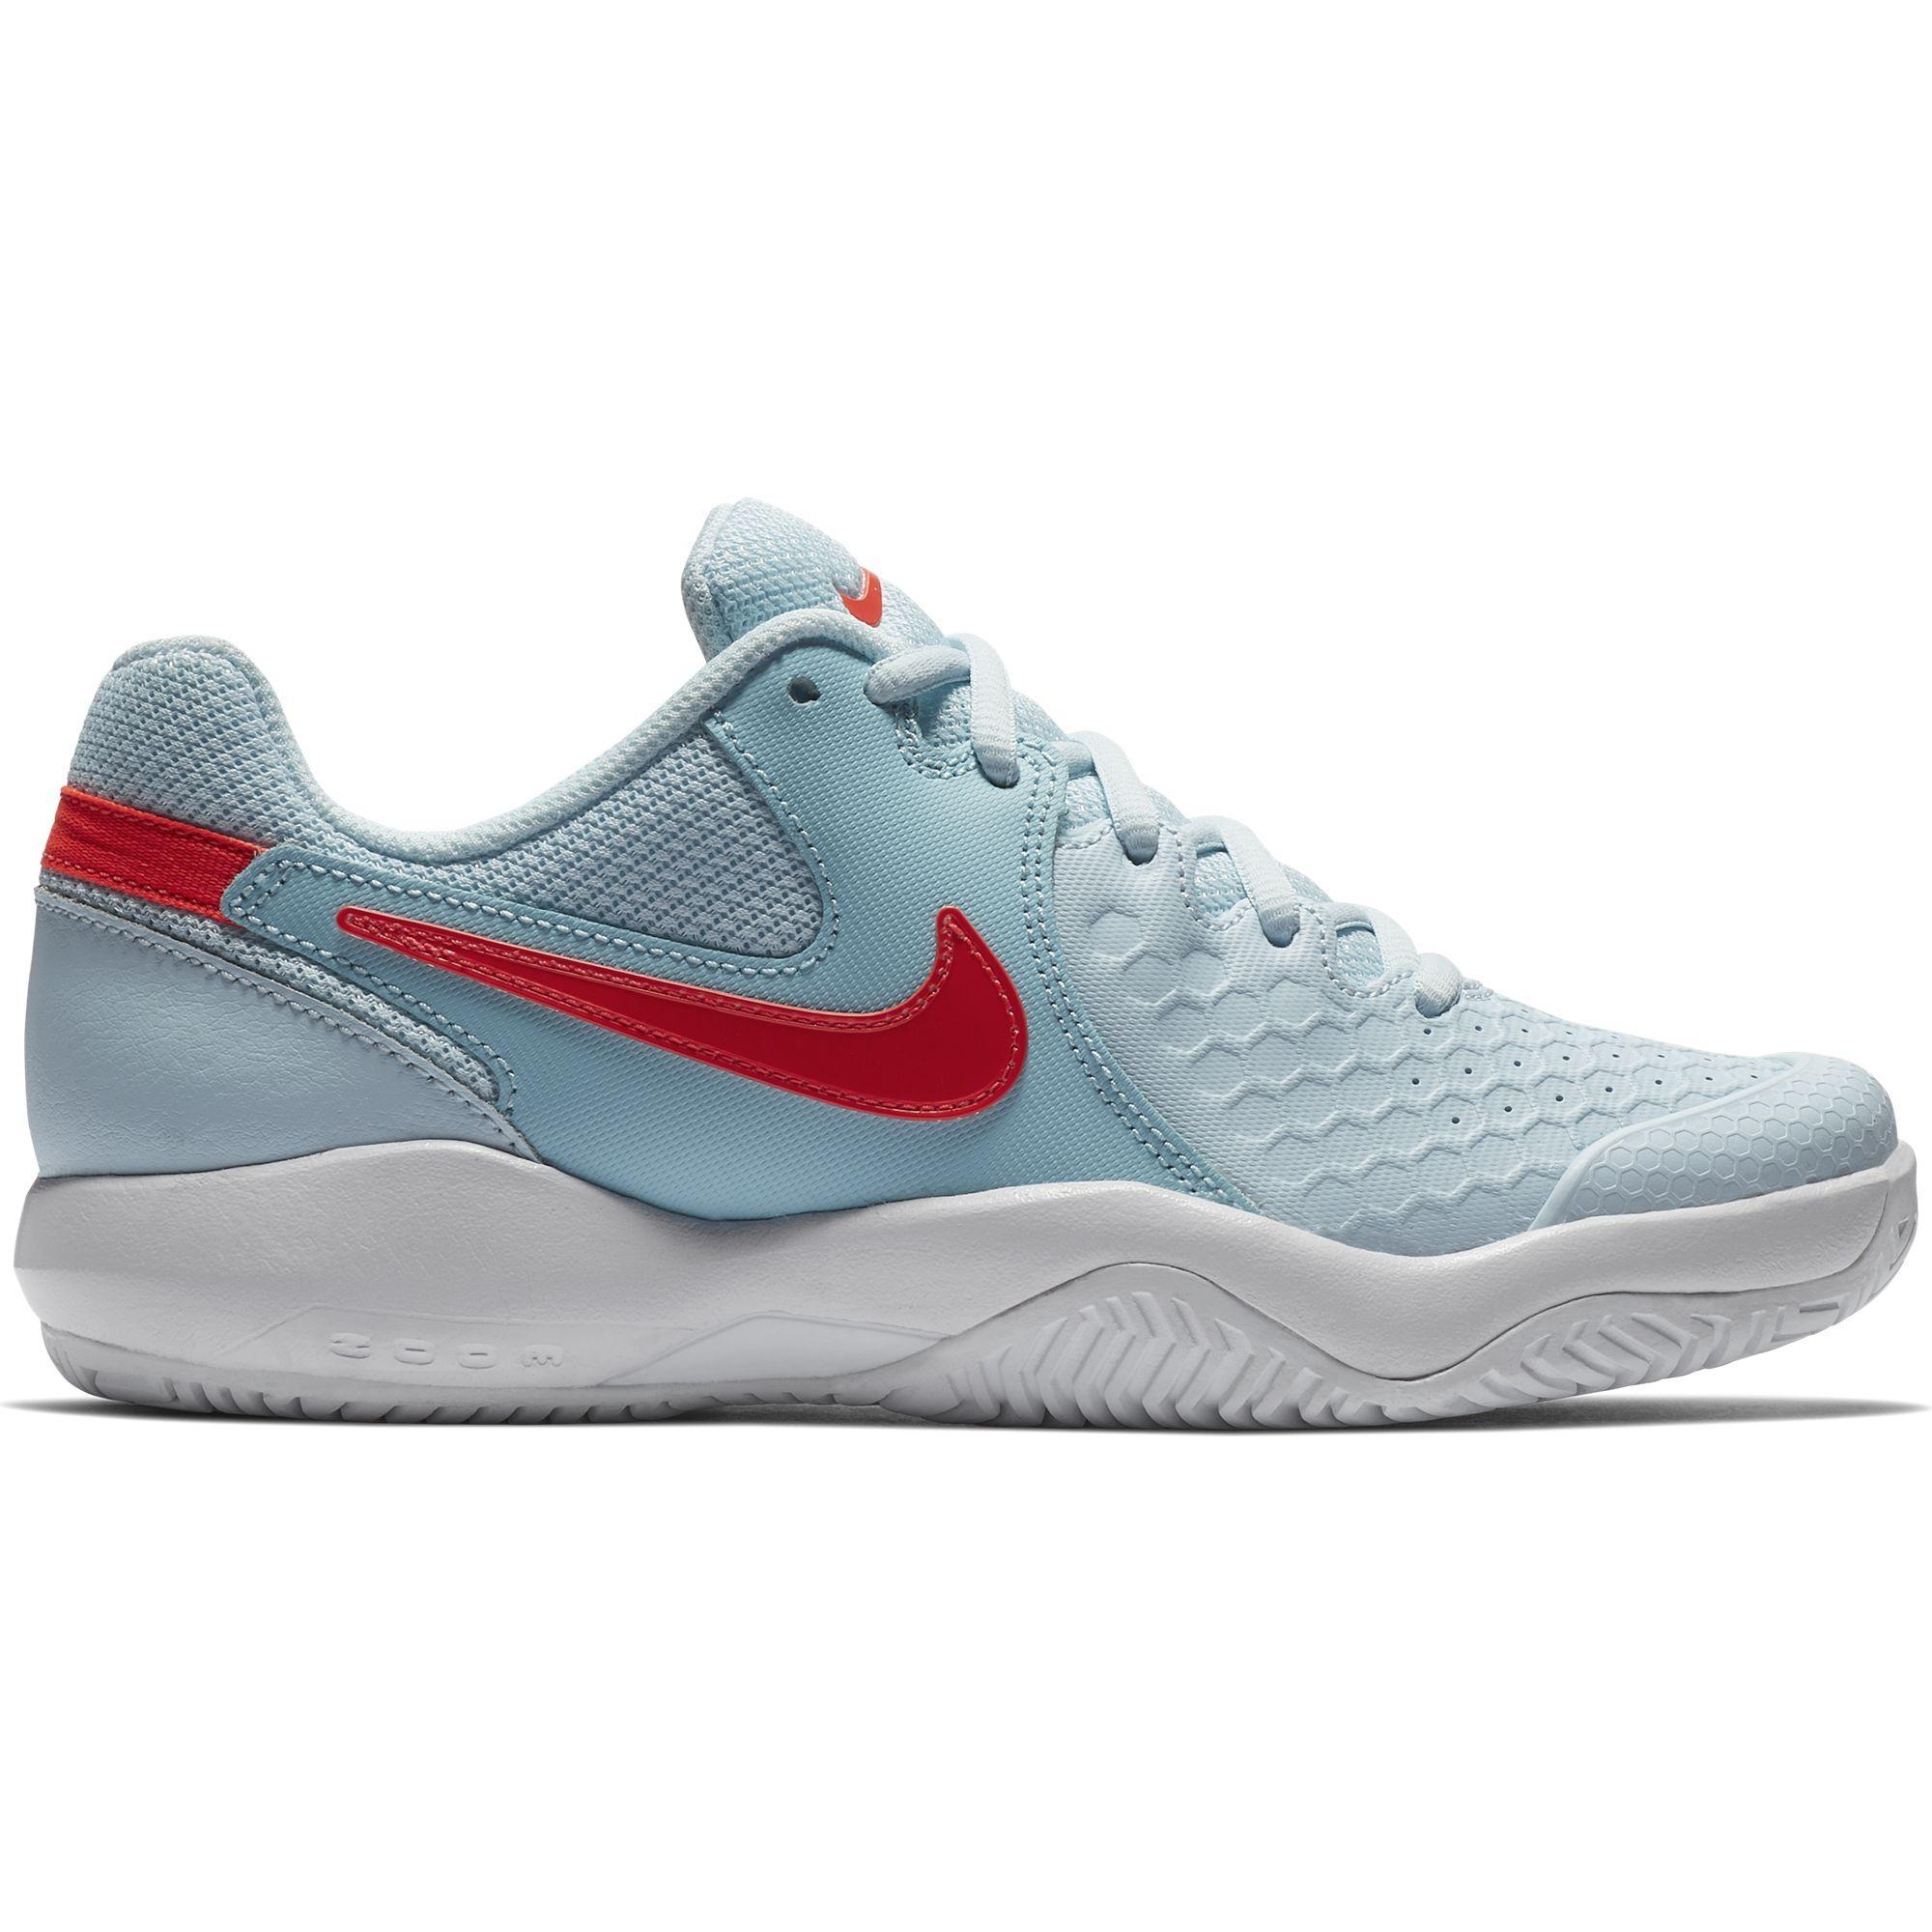 1eb5a27ab9e09e Nike Womens Air Zoom Resistance Tennis Shoes - Topaz Mist Still Blue -  Tennisnuts.com